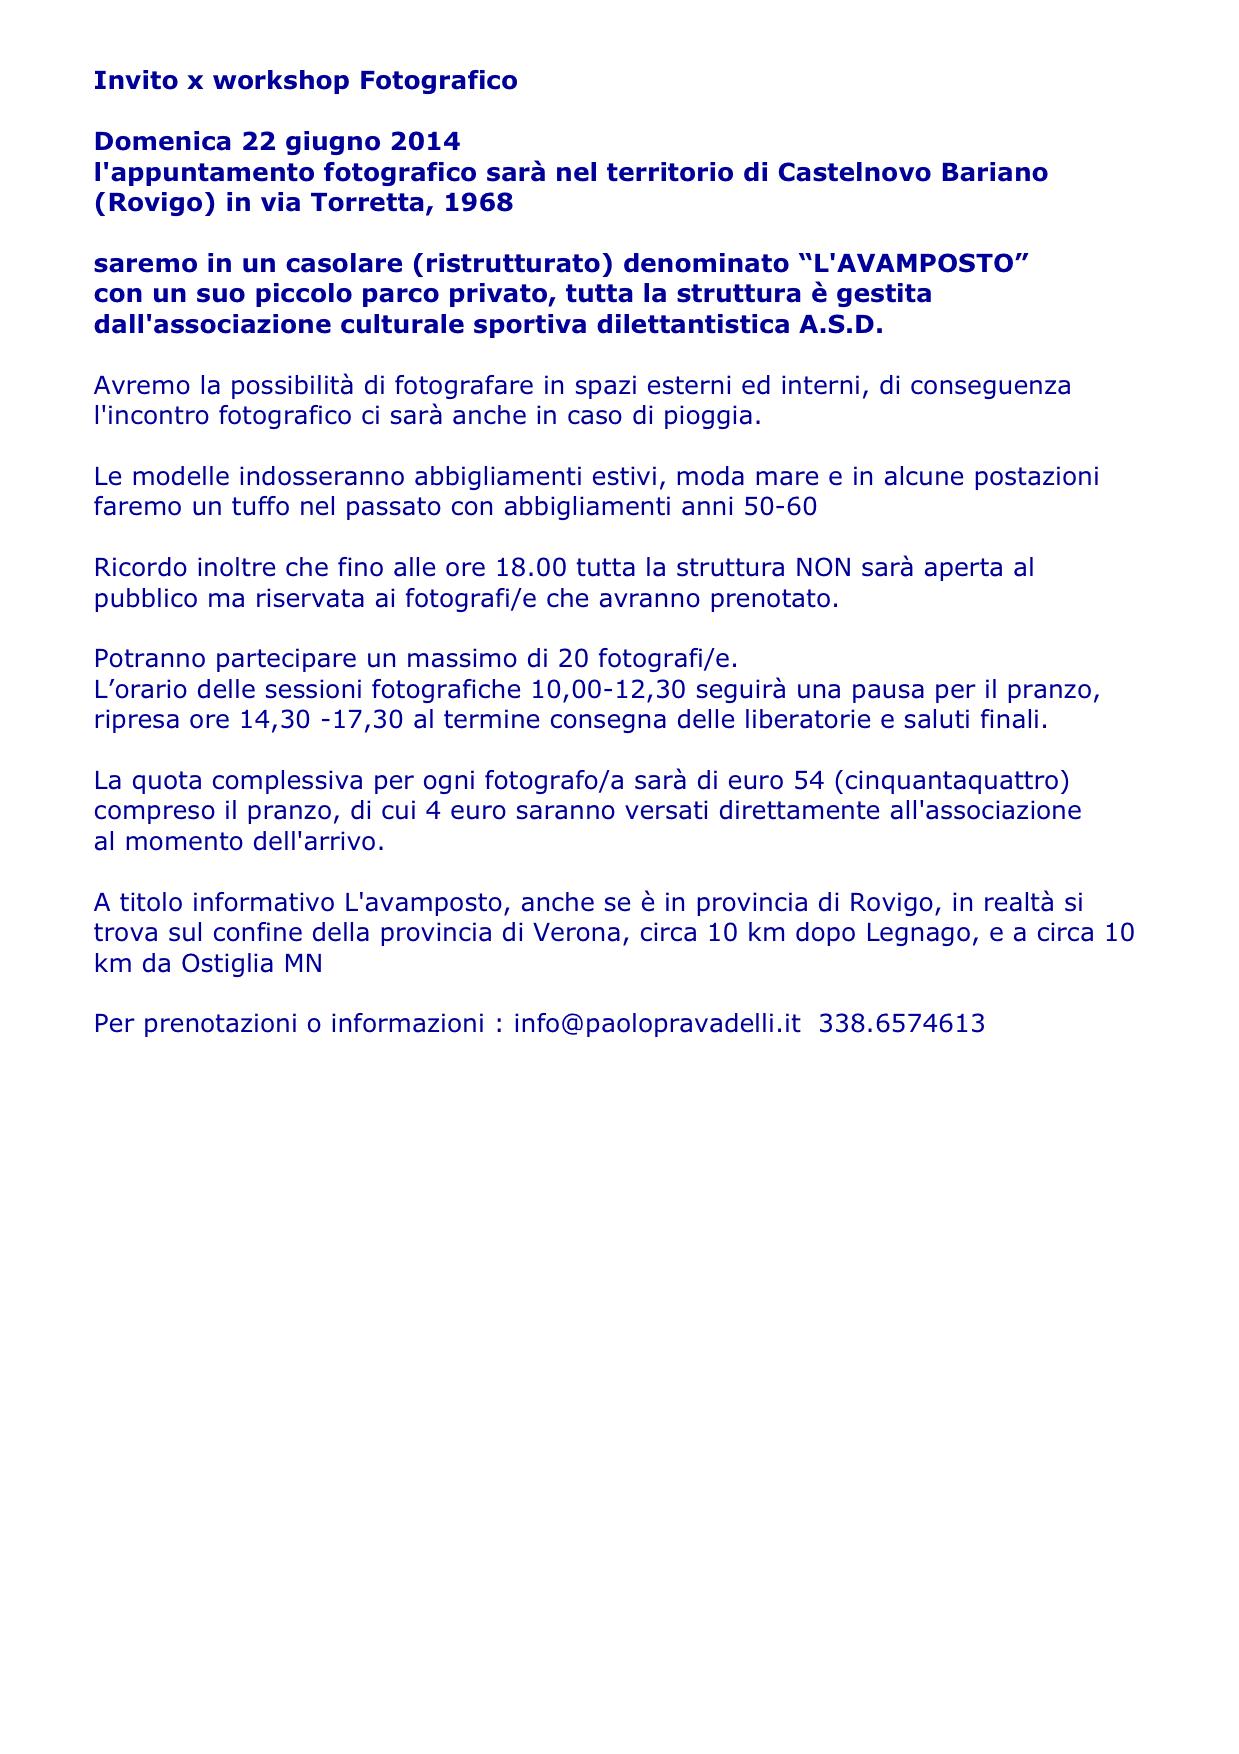 Newsletter fiaf di 19 mag 2014 for Giostre net usato